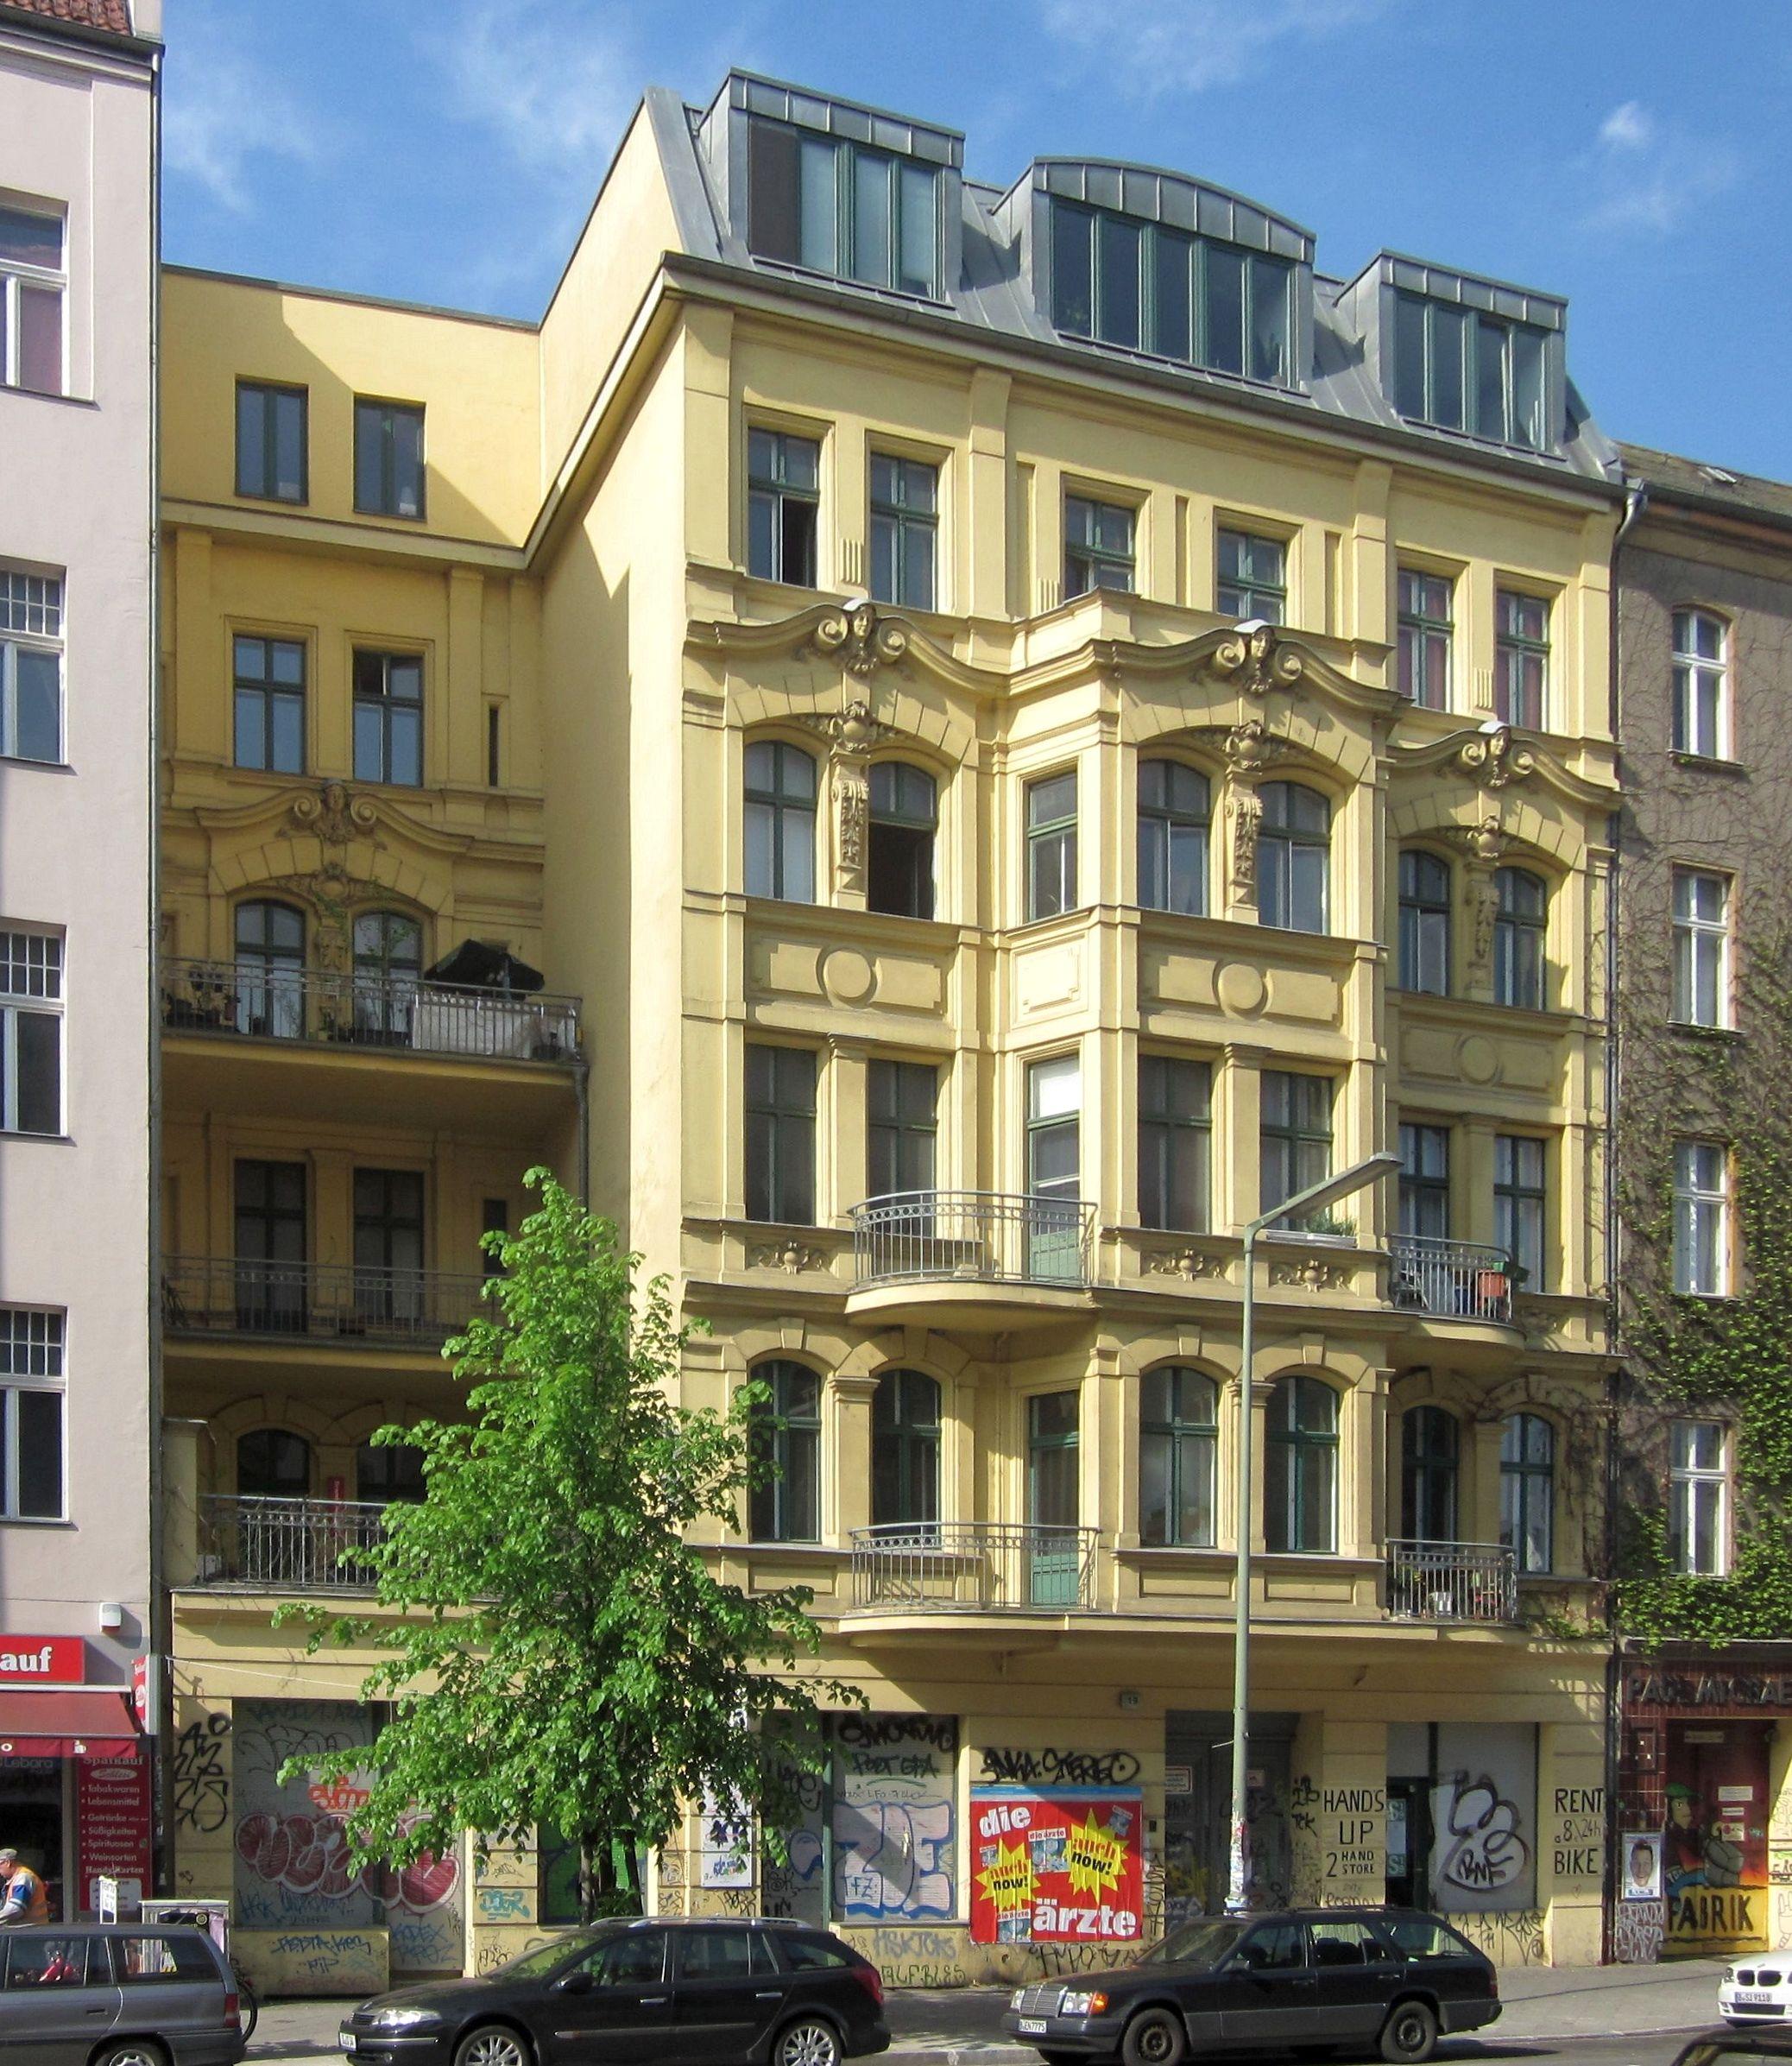 file berlin kreuzberg schlesische strasse 19 wikimedia commons. Black Bedroom Furniture Sets. Home Design Ideas